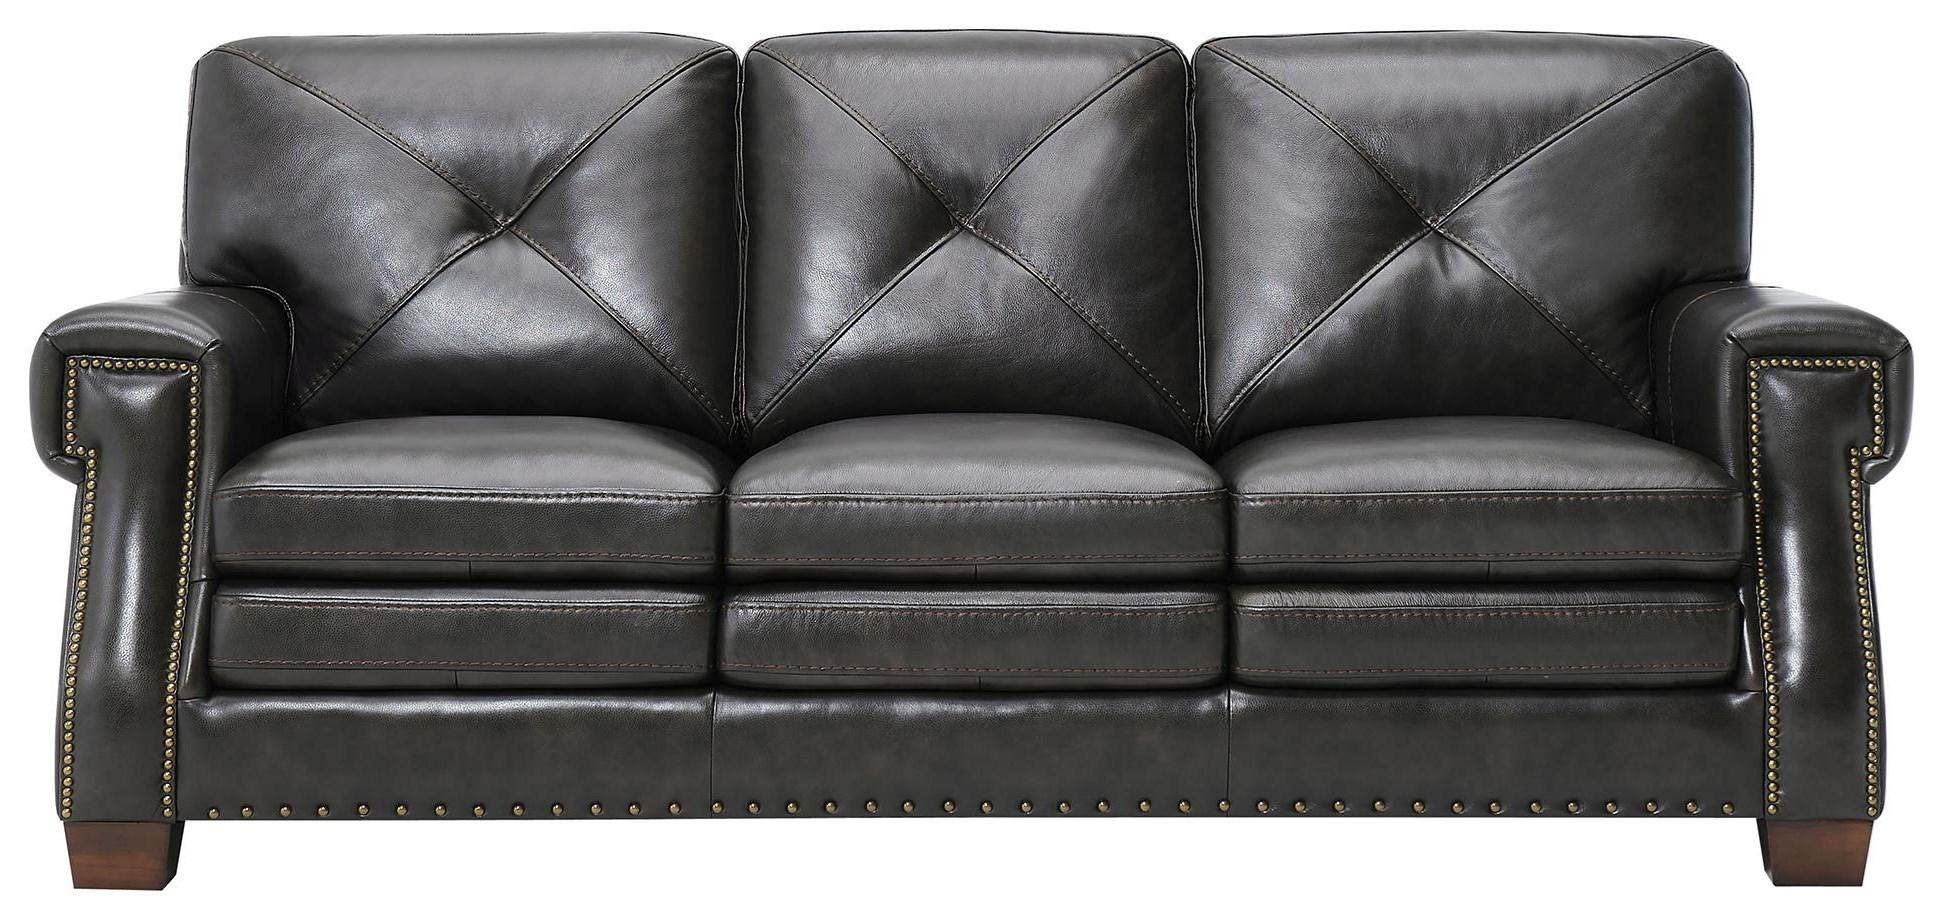 Tori Leather Sofa at Rotmans